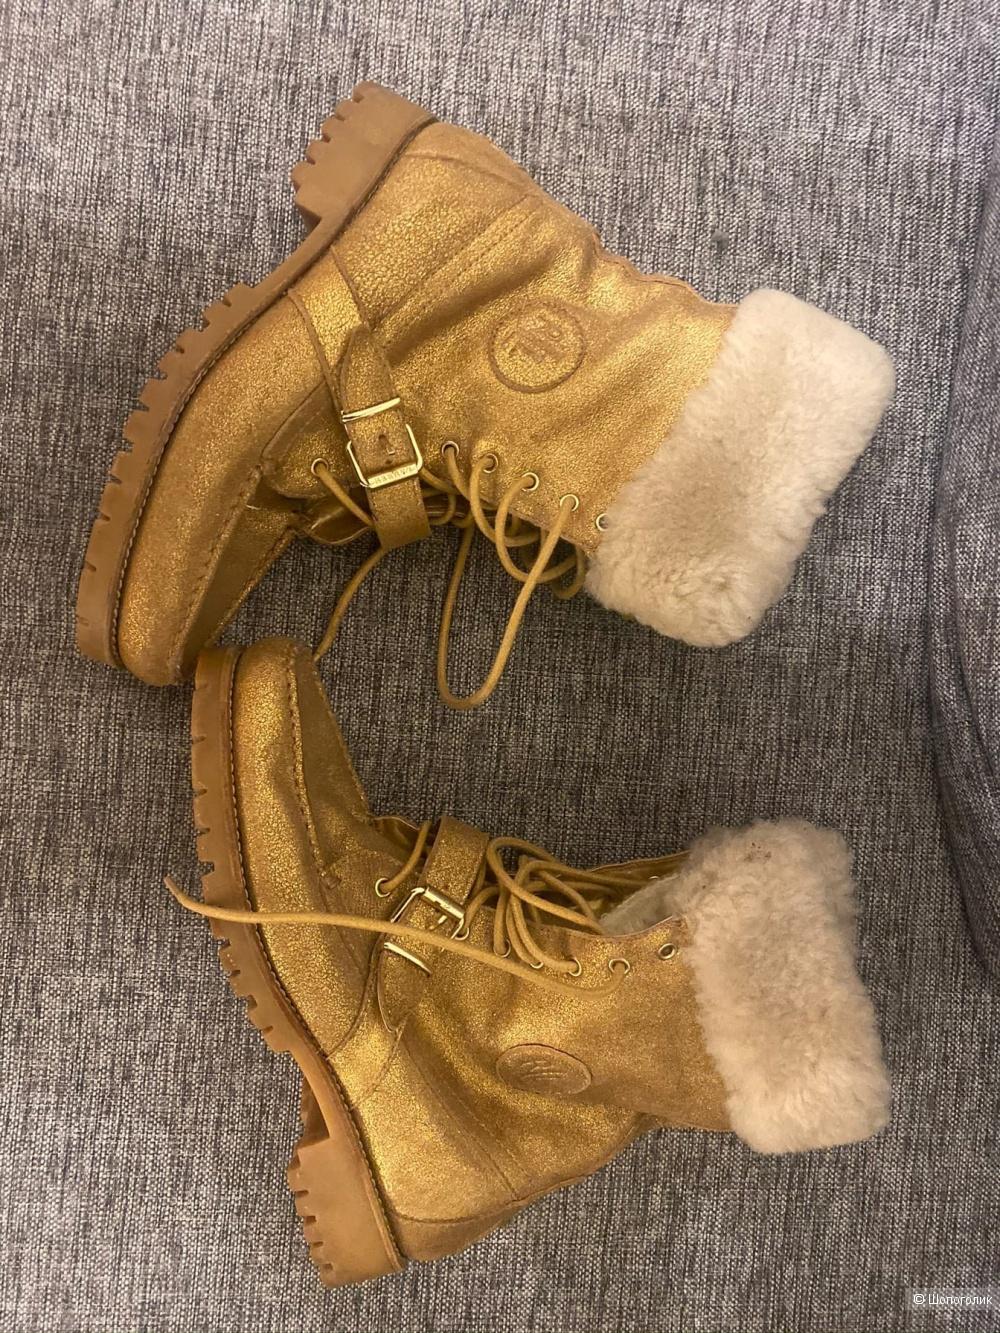 Ботинки Ralph Lauren, 39 размер